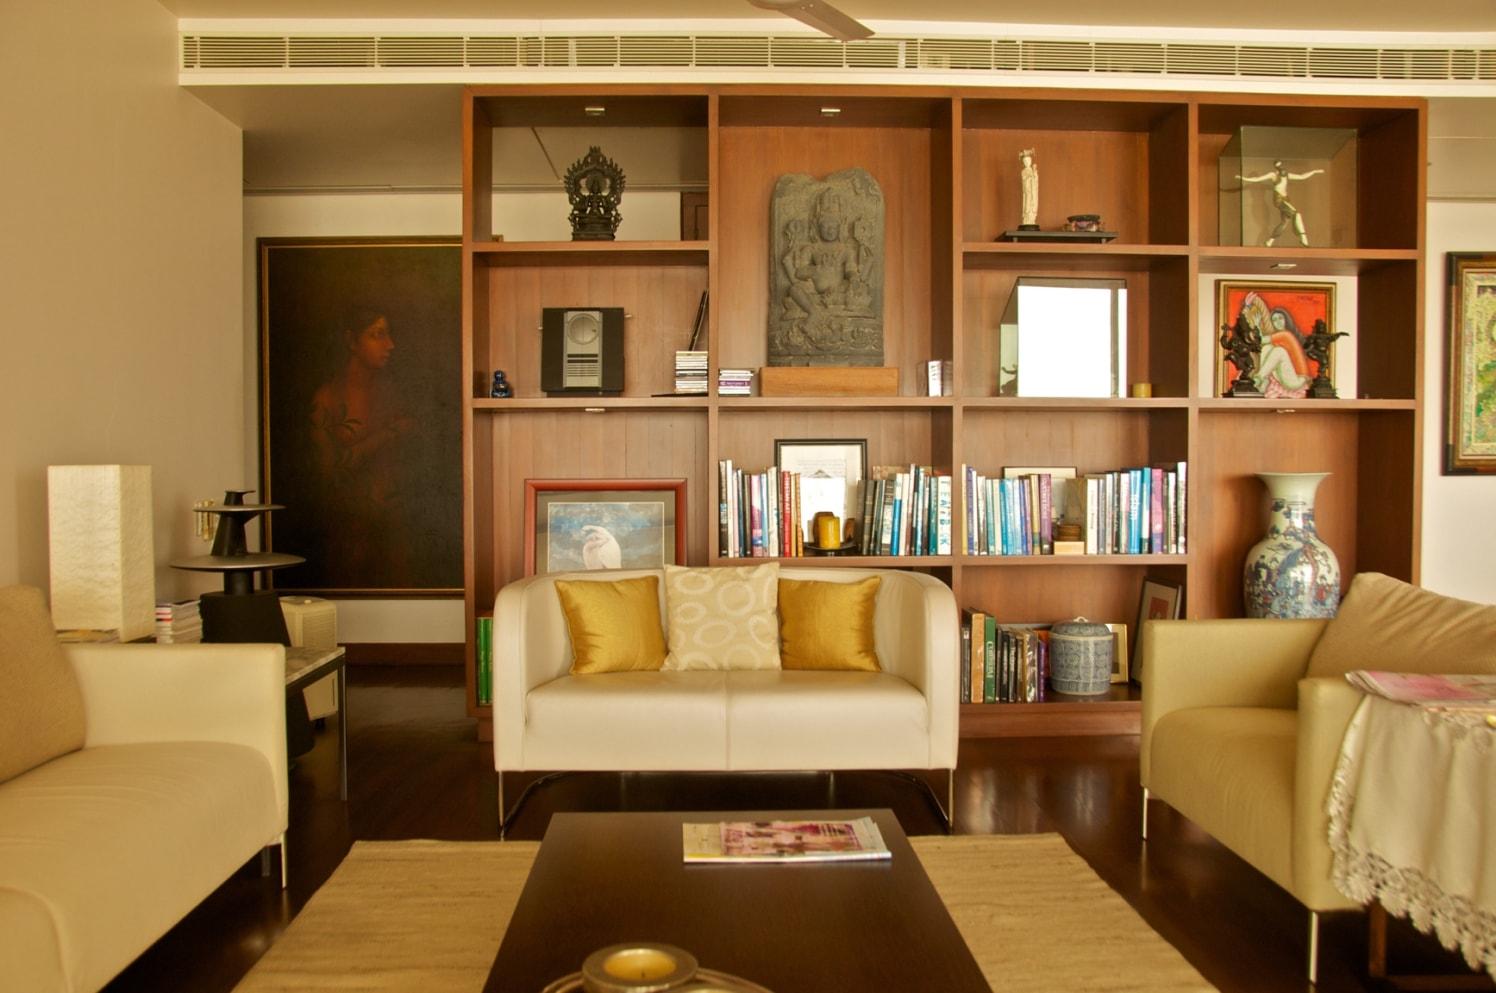 Creamy Sofa Set with Walnut Brown Display Unit by Viraf Laskari  Living-room Contemporary | Interior Design Photos & Ideas